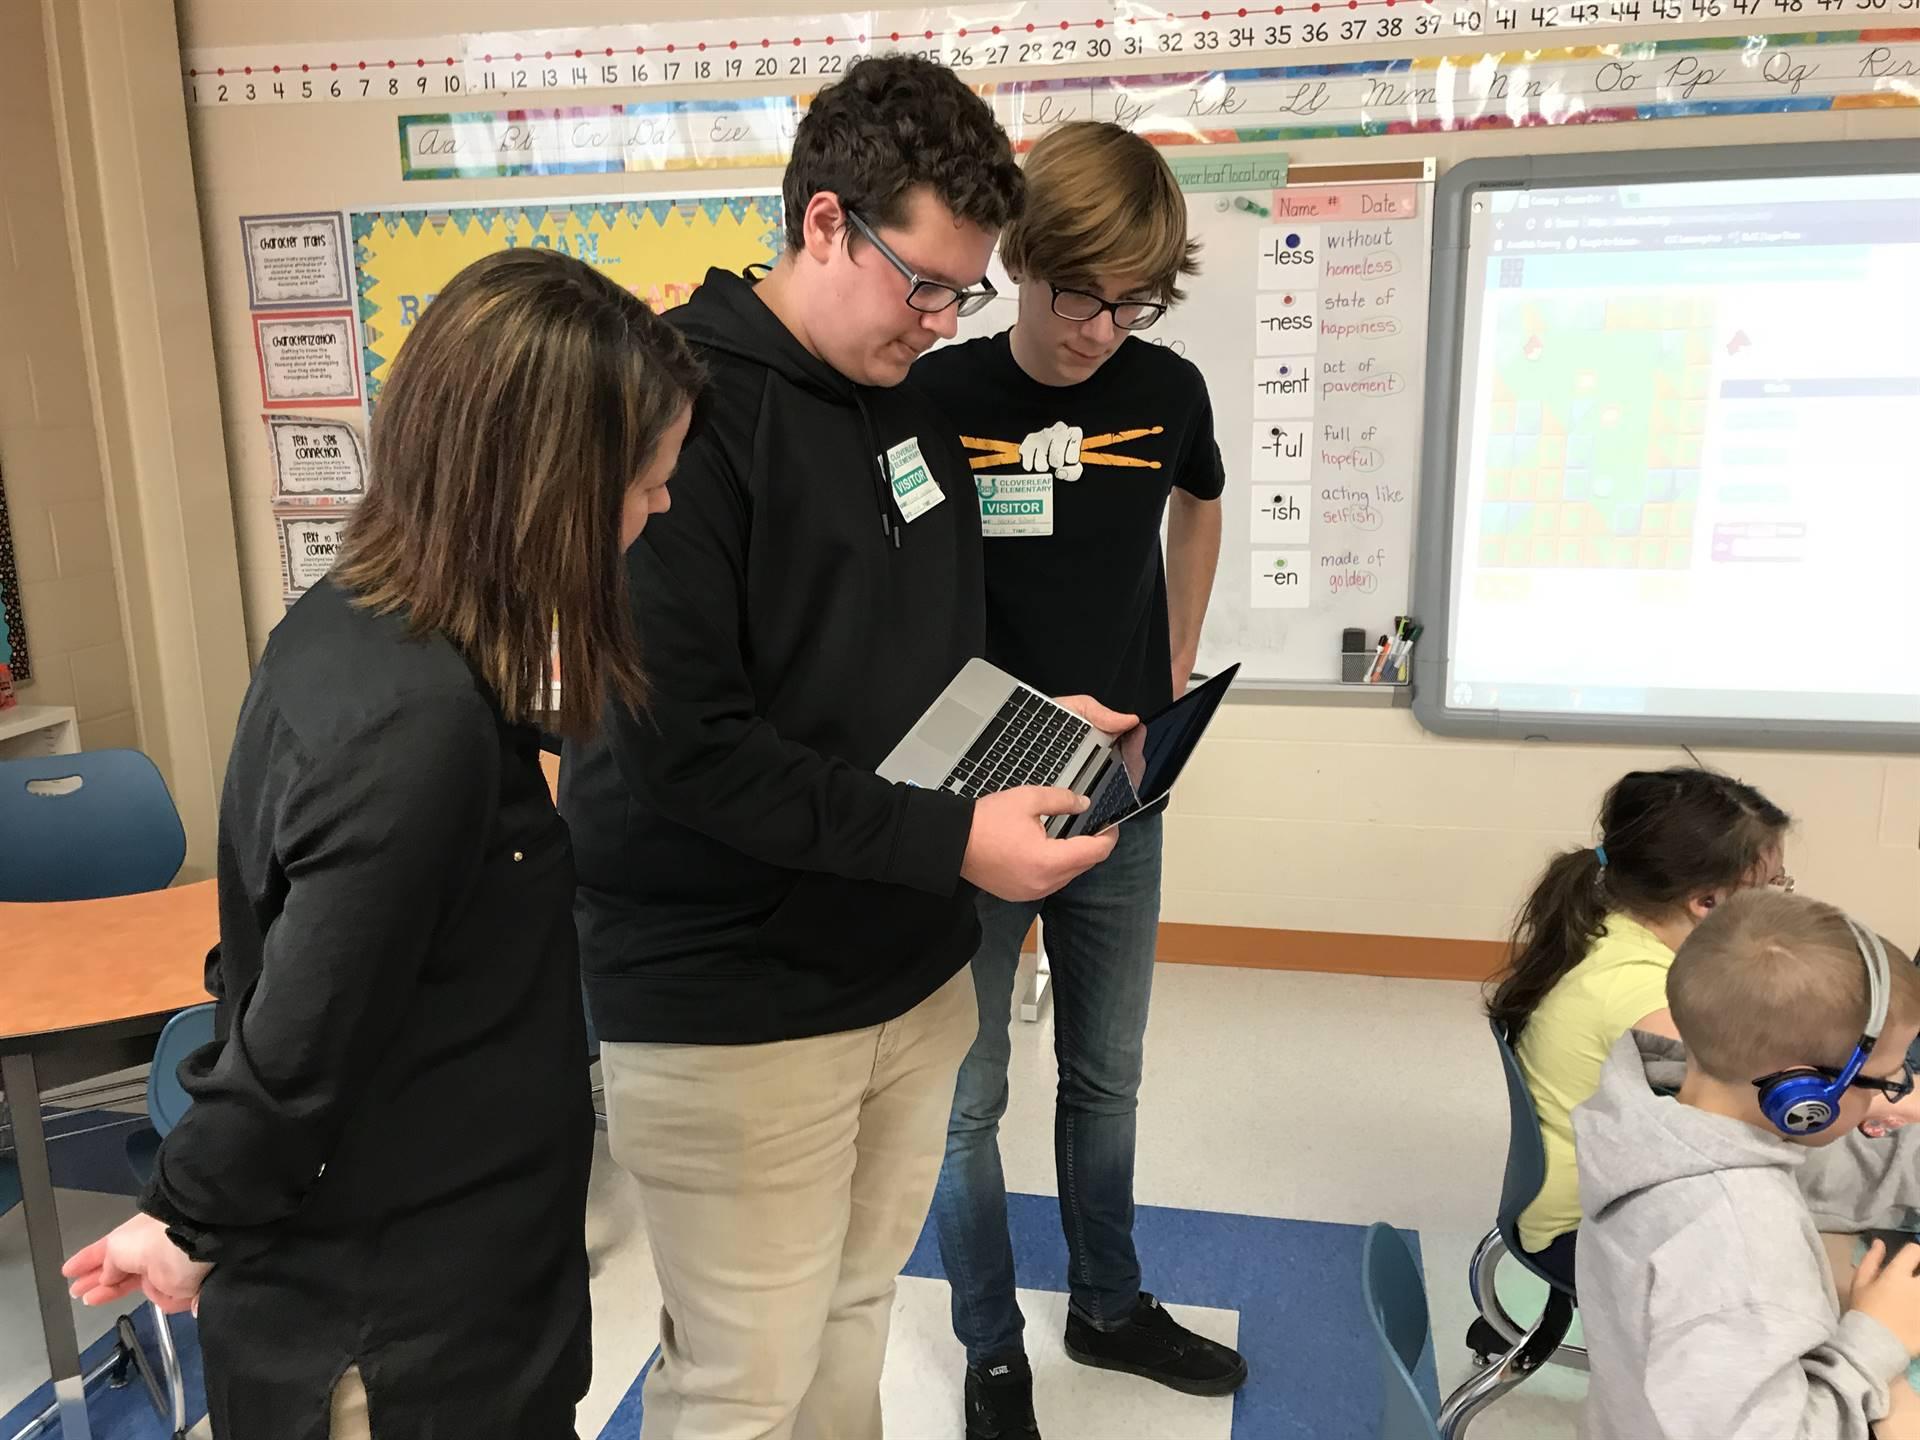 Students use Blockly, a kid-friendly computer programming language.